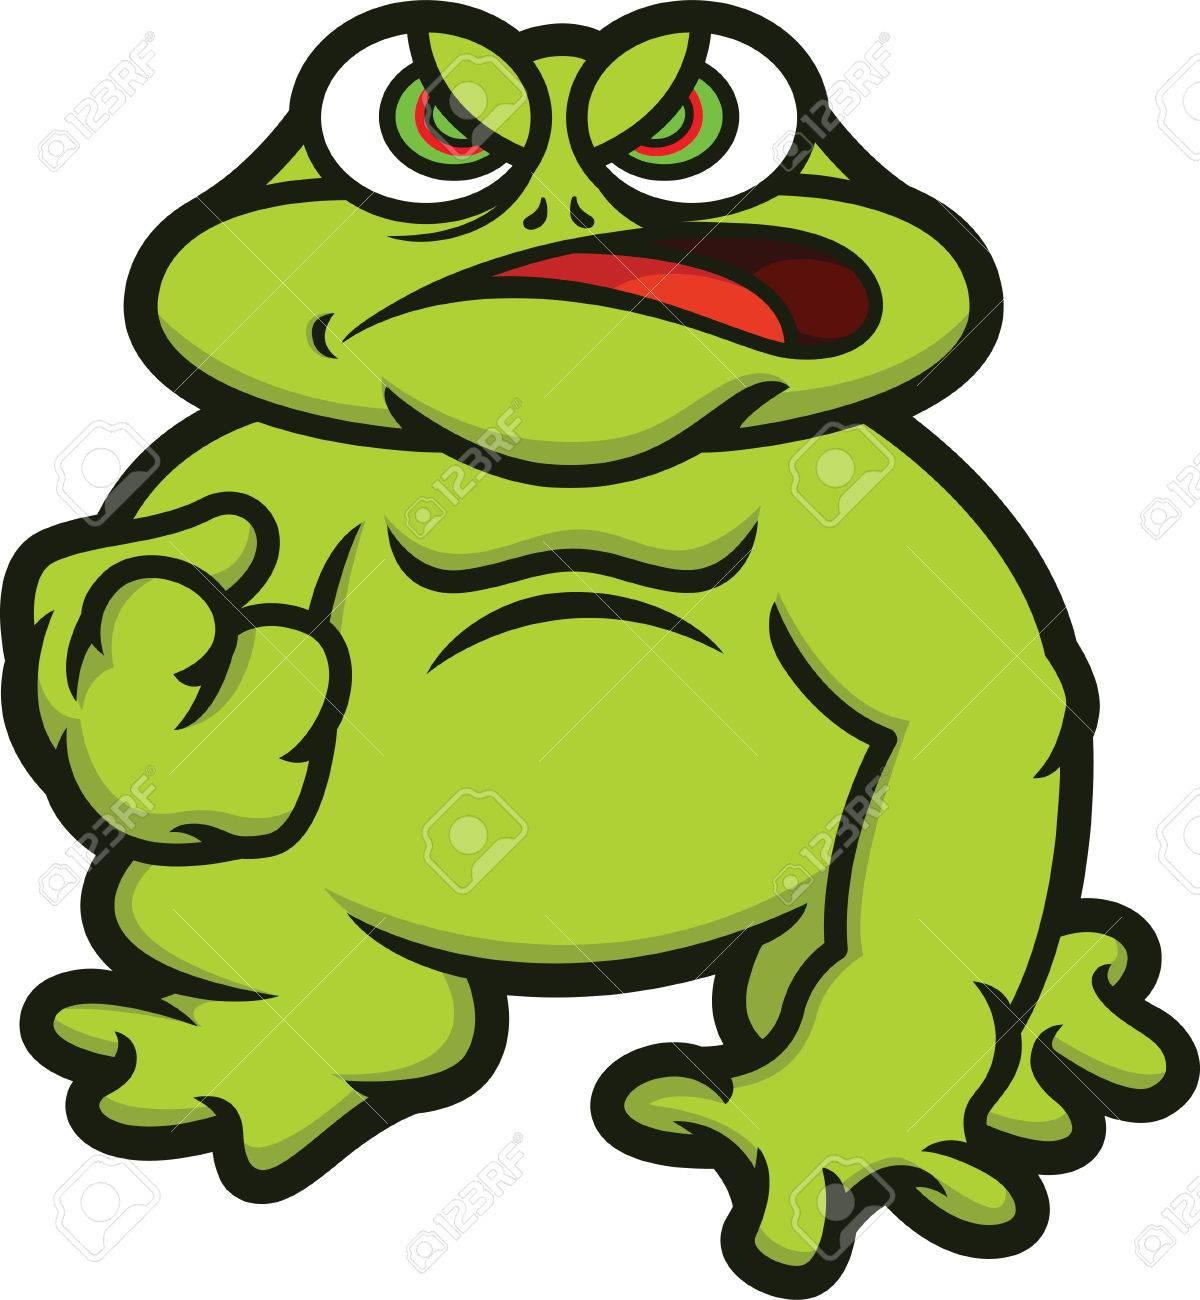 bullfrog cartoon royalty free cliparts vectors and stock rh 123rf com jeremiah bullfrog cartoon cartoon bullfrog pictures